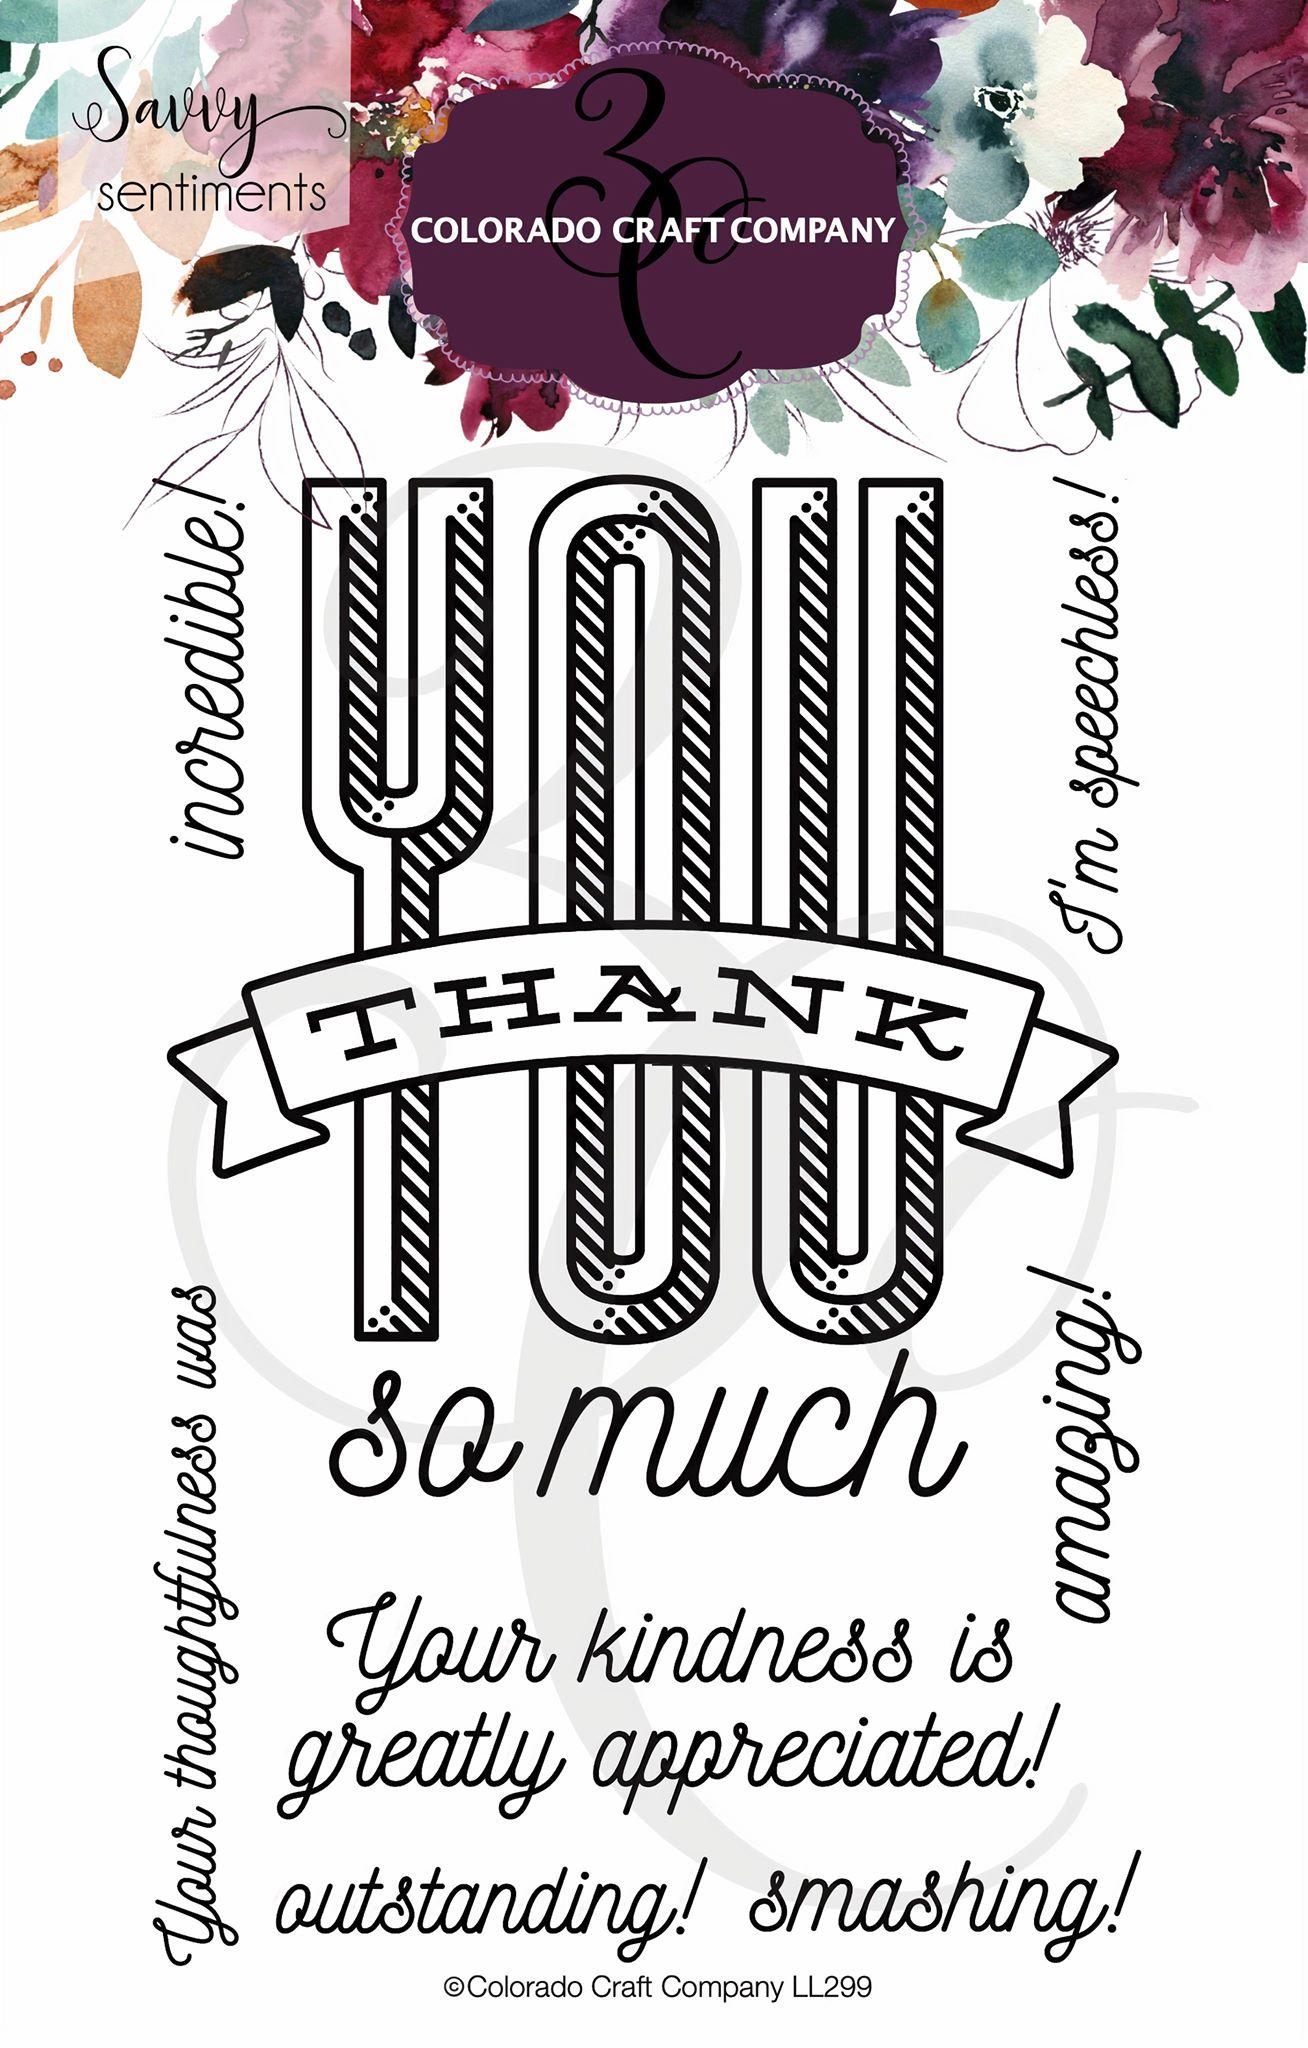 Colorado Craft Co. - Savvy Sentiments Thank You Stamp Set